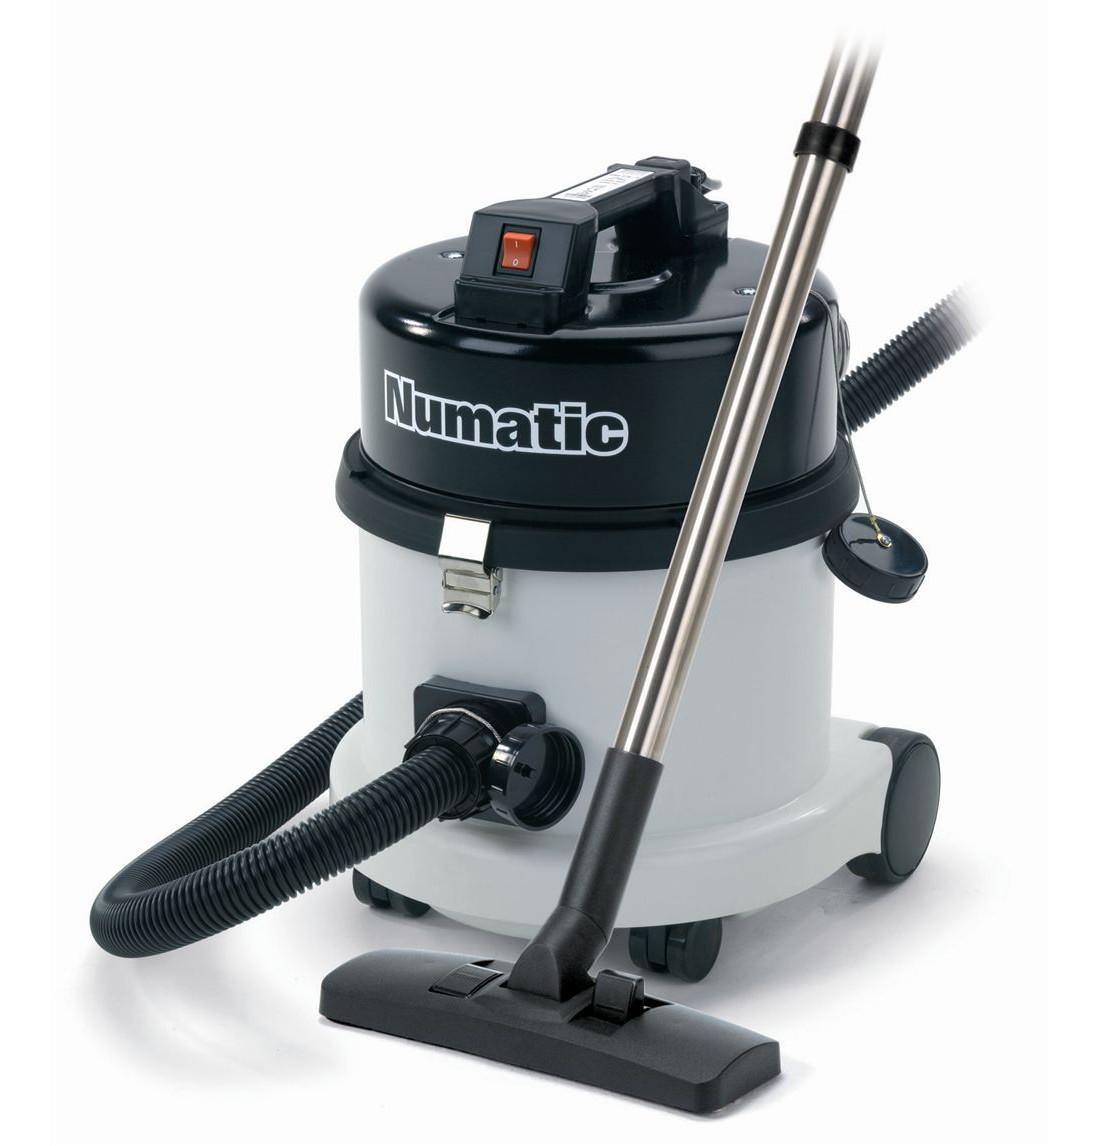 Numatic-CRQ370-Clean-Room-Vacuum-240v--845616-